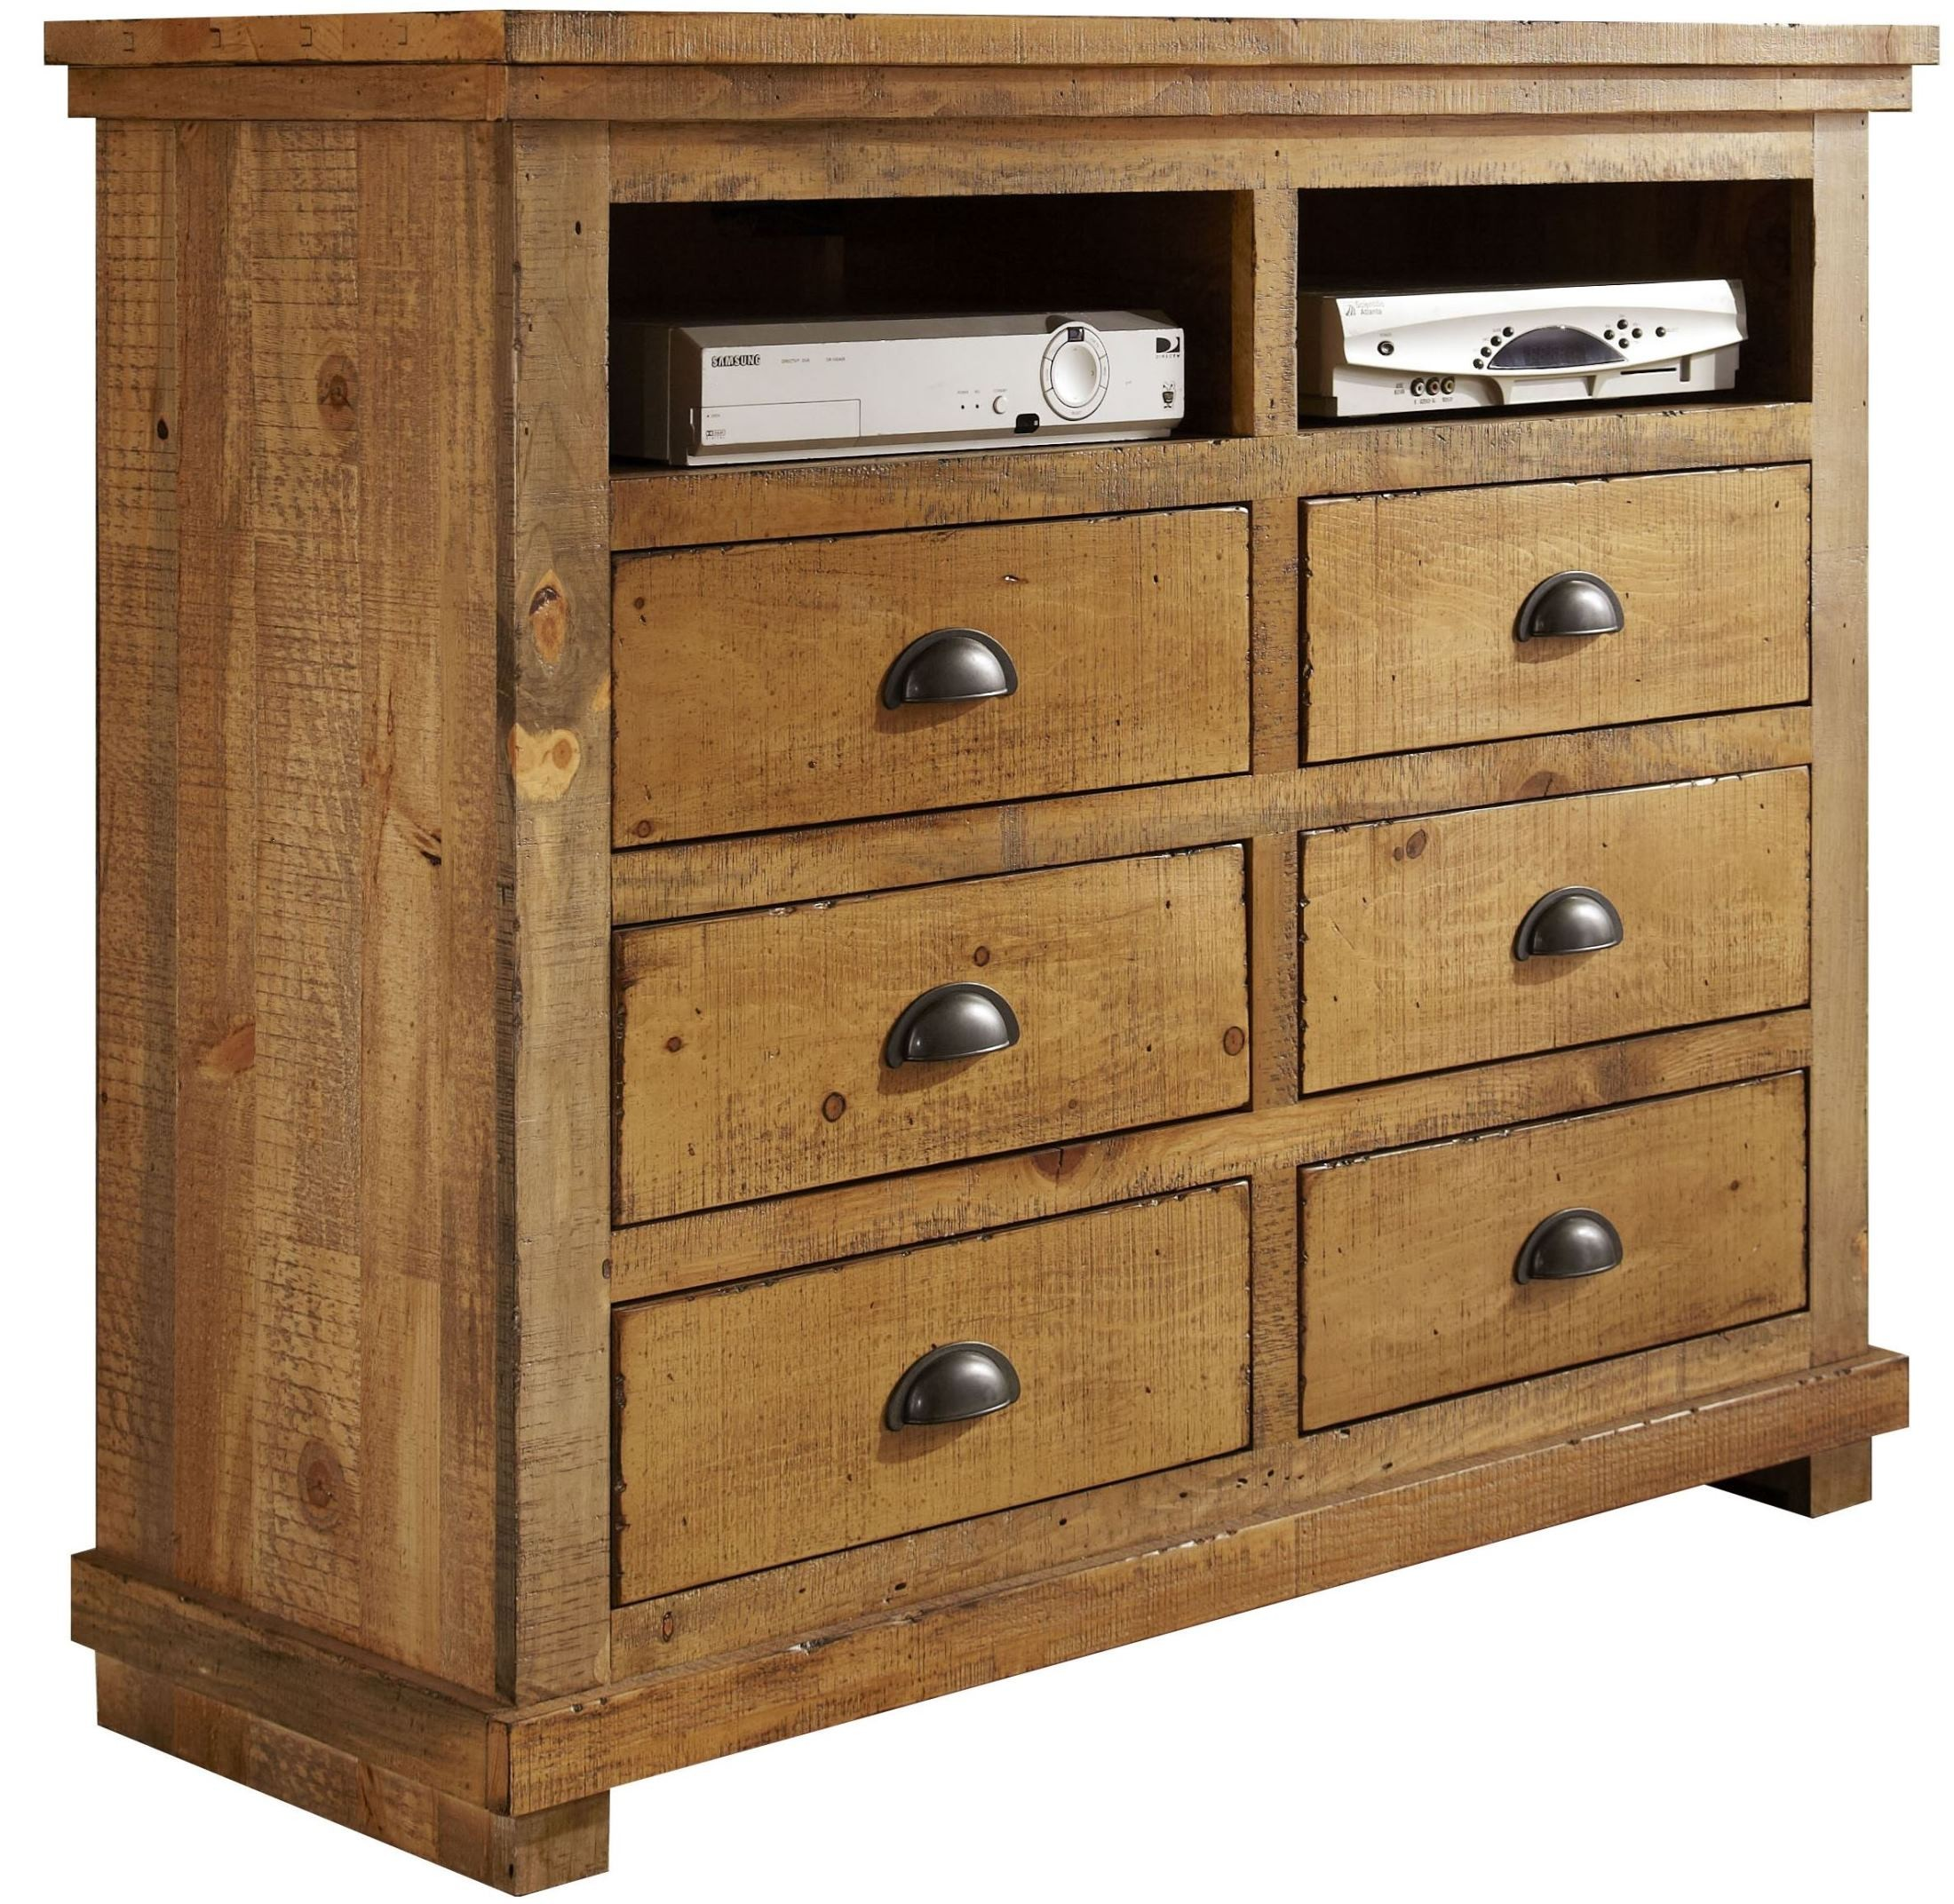 Willow distressed pine slat bedroom set p608 60 61 78 progressive for Distressed pine bedroom furniture